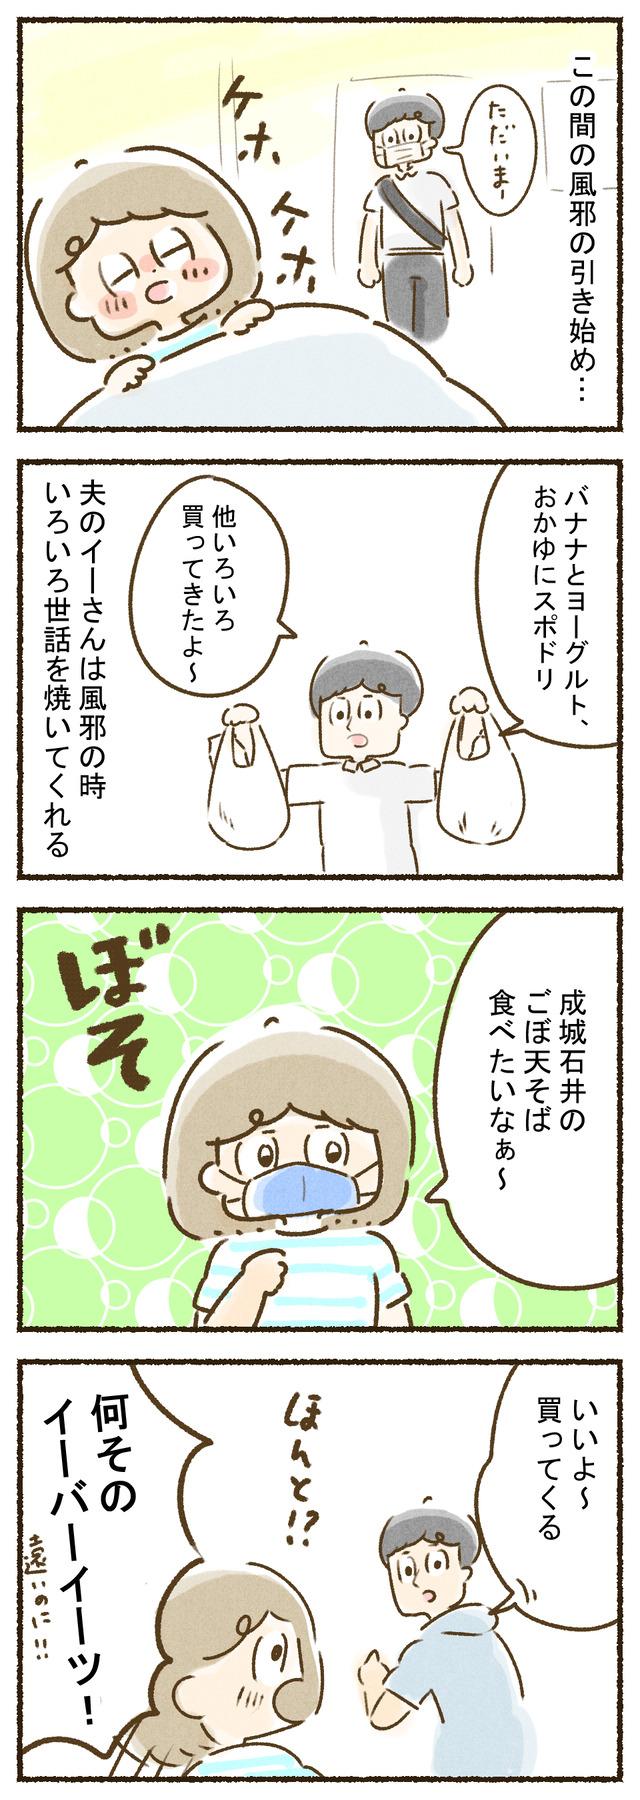 eabareats_01